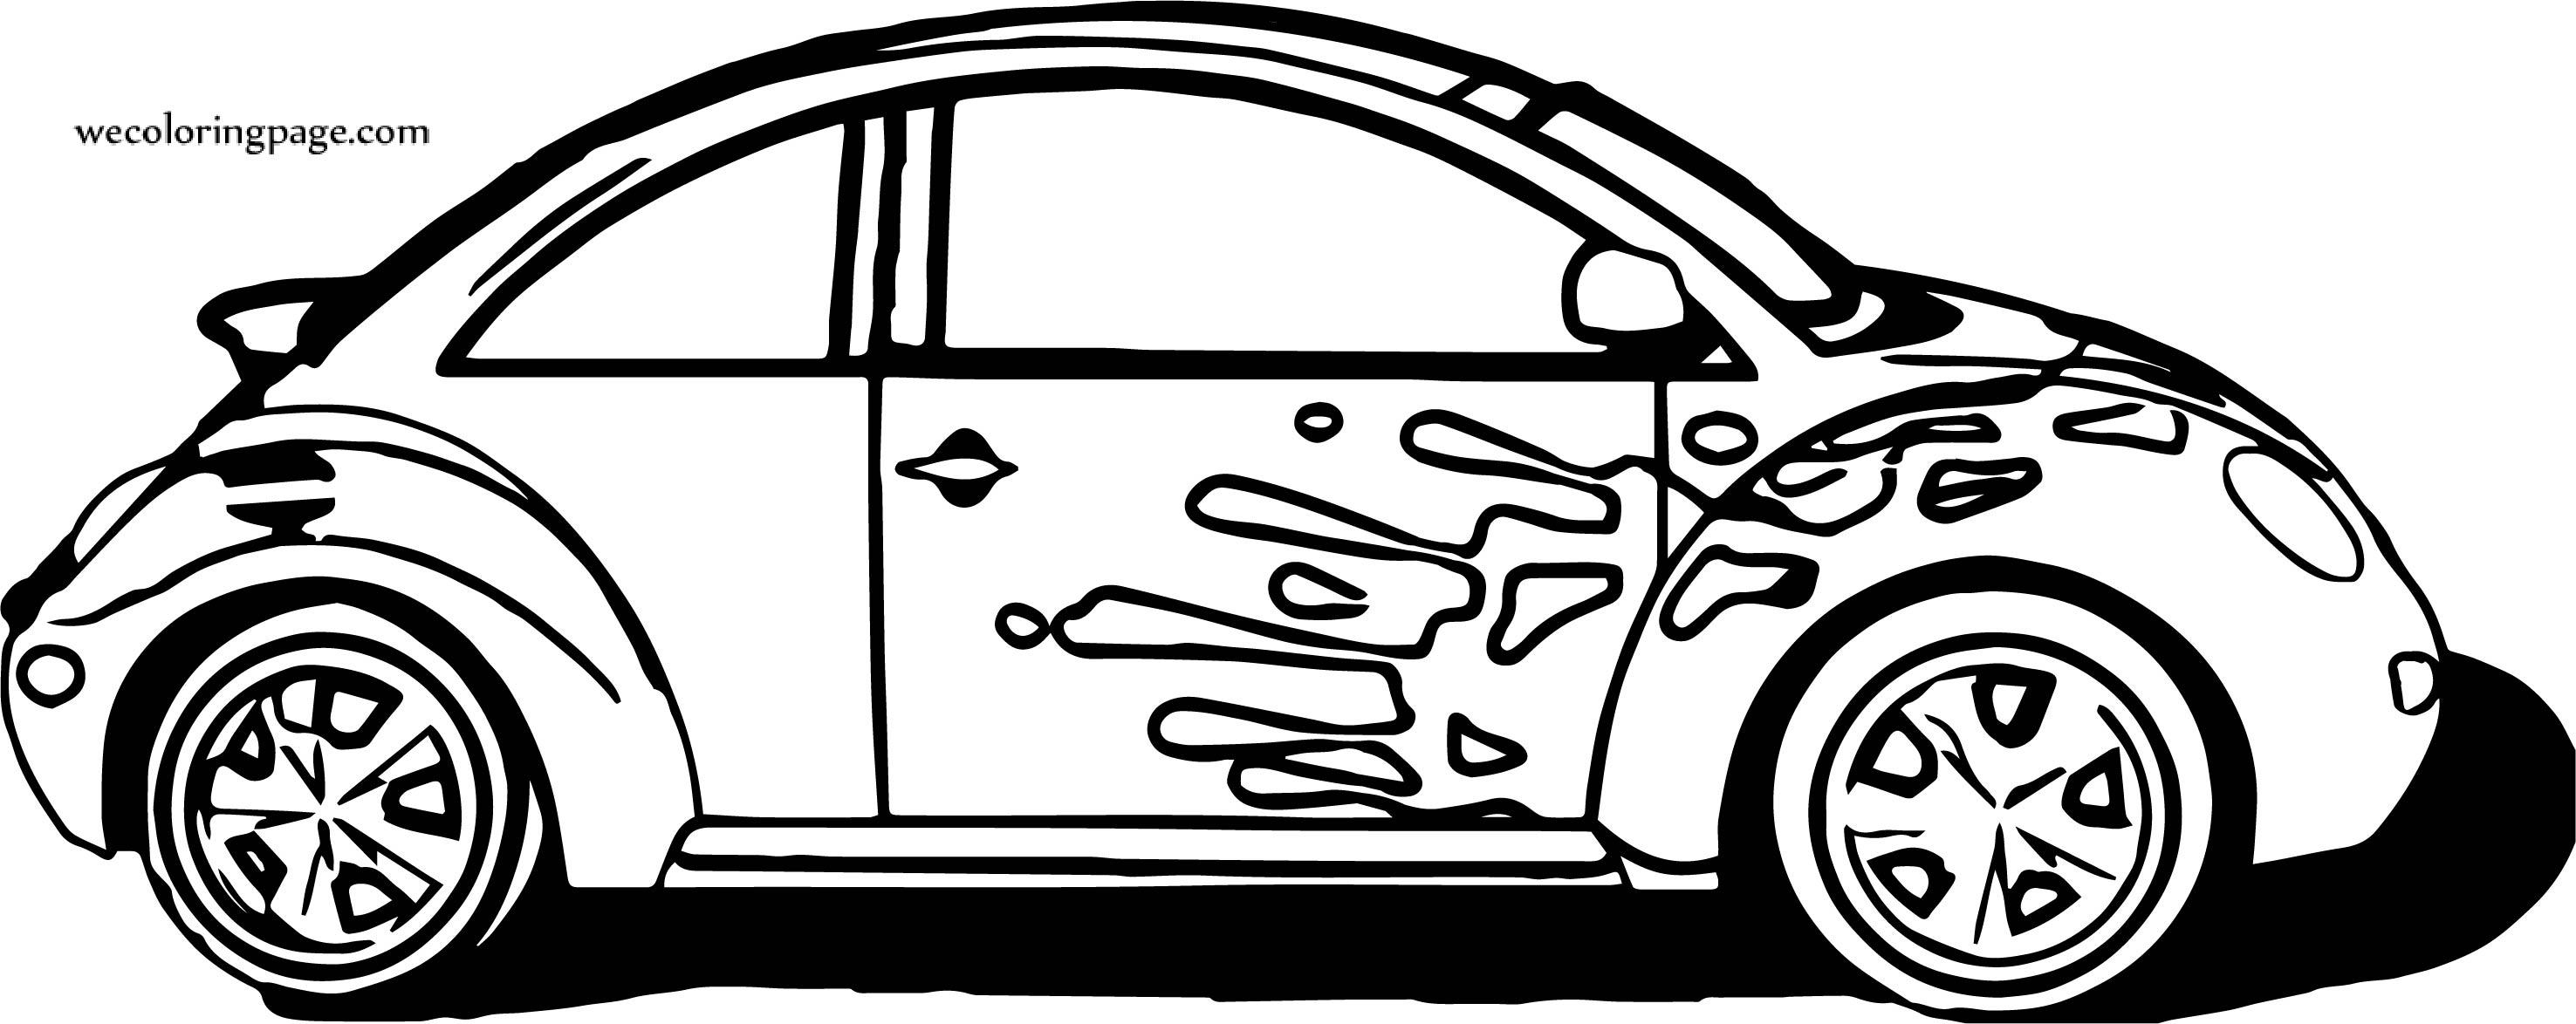 Car Volkswagen Beetle Coloring Page